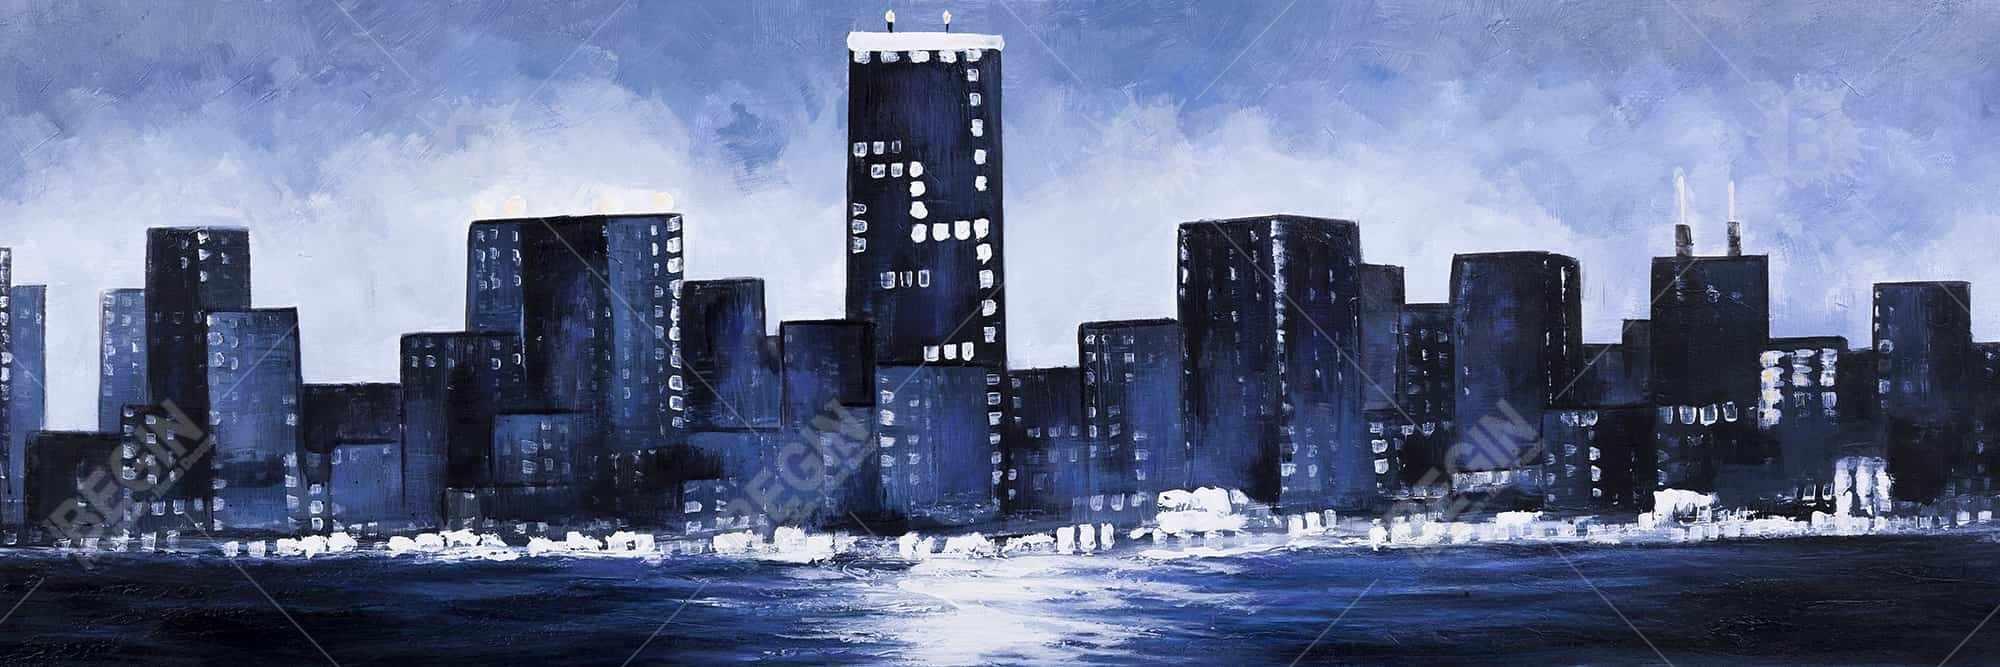 Marine blue city